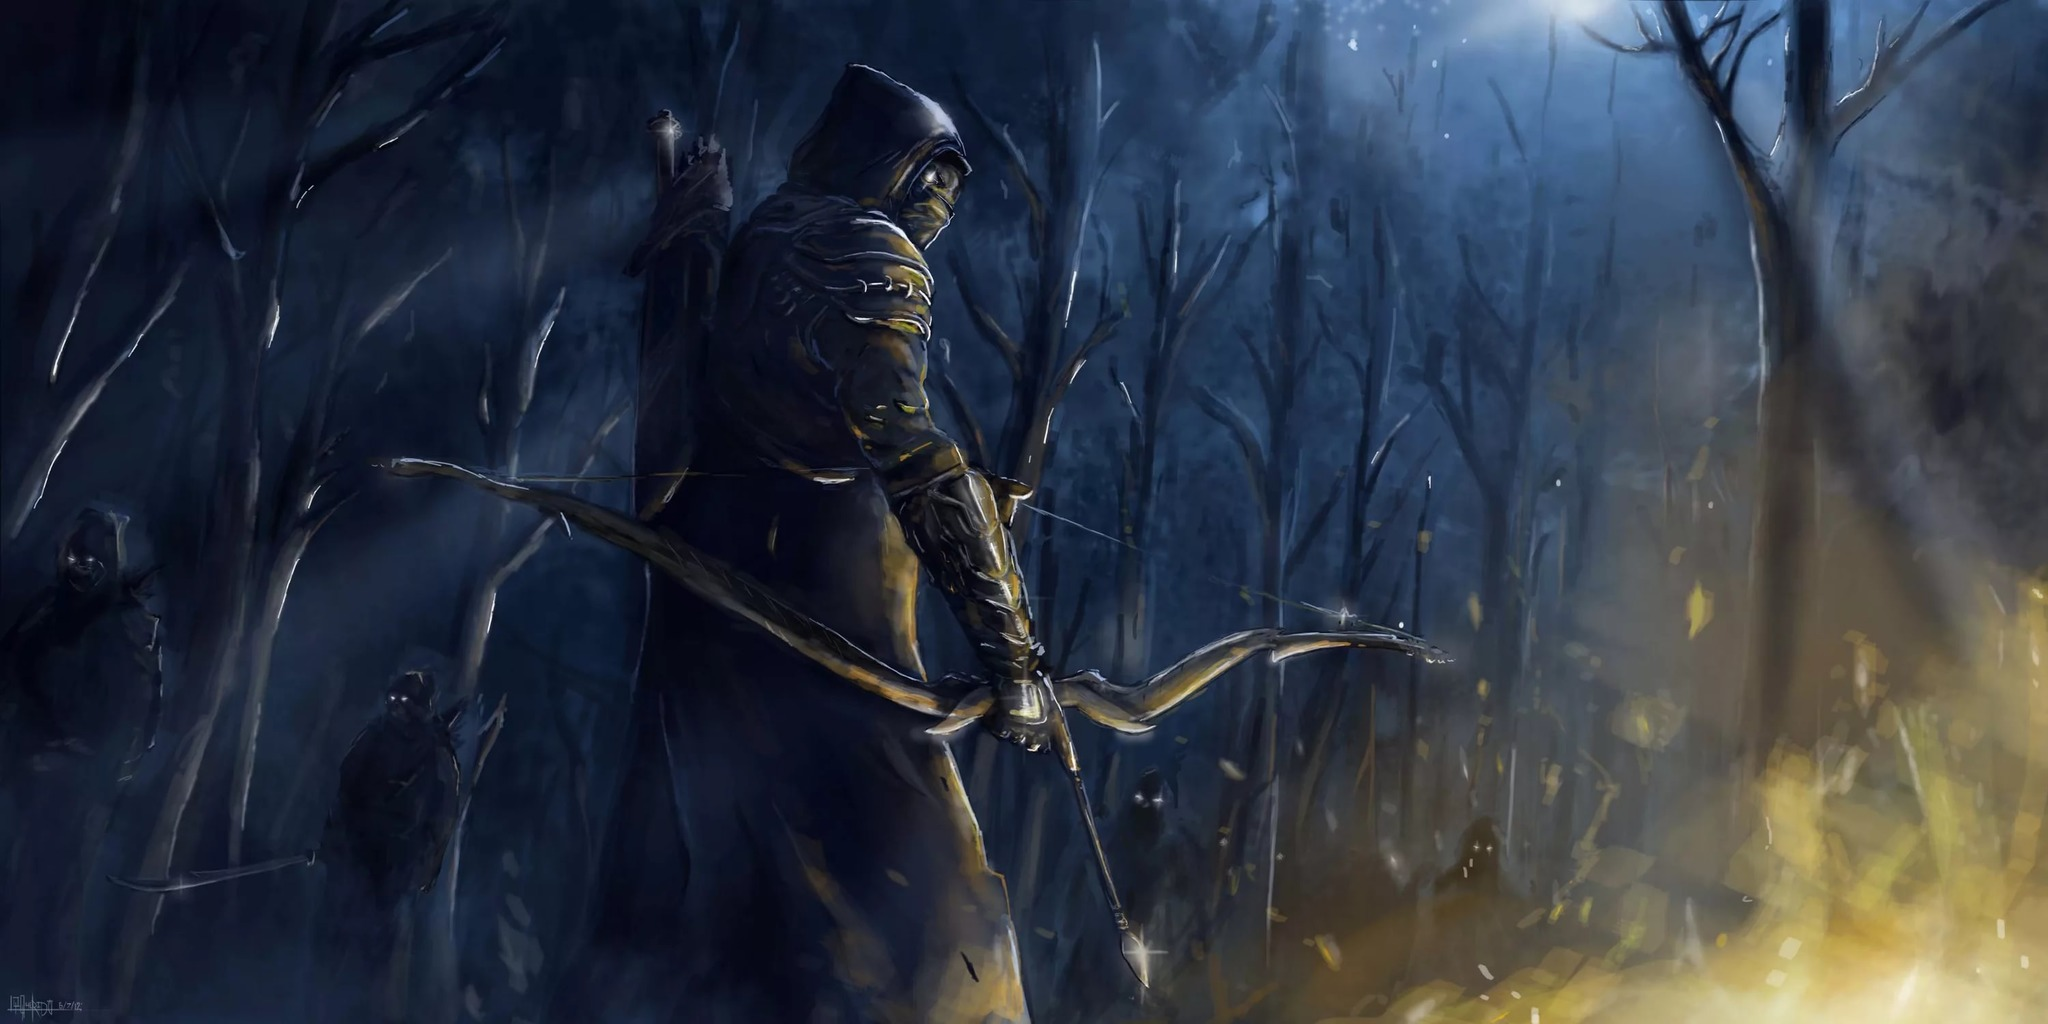 IMG_5387.JPG - Elder Scrolls 5: Skyrim, the Арт